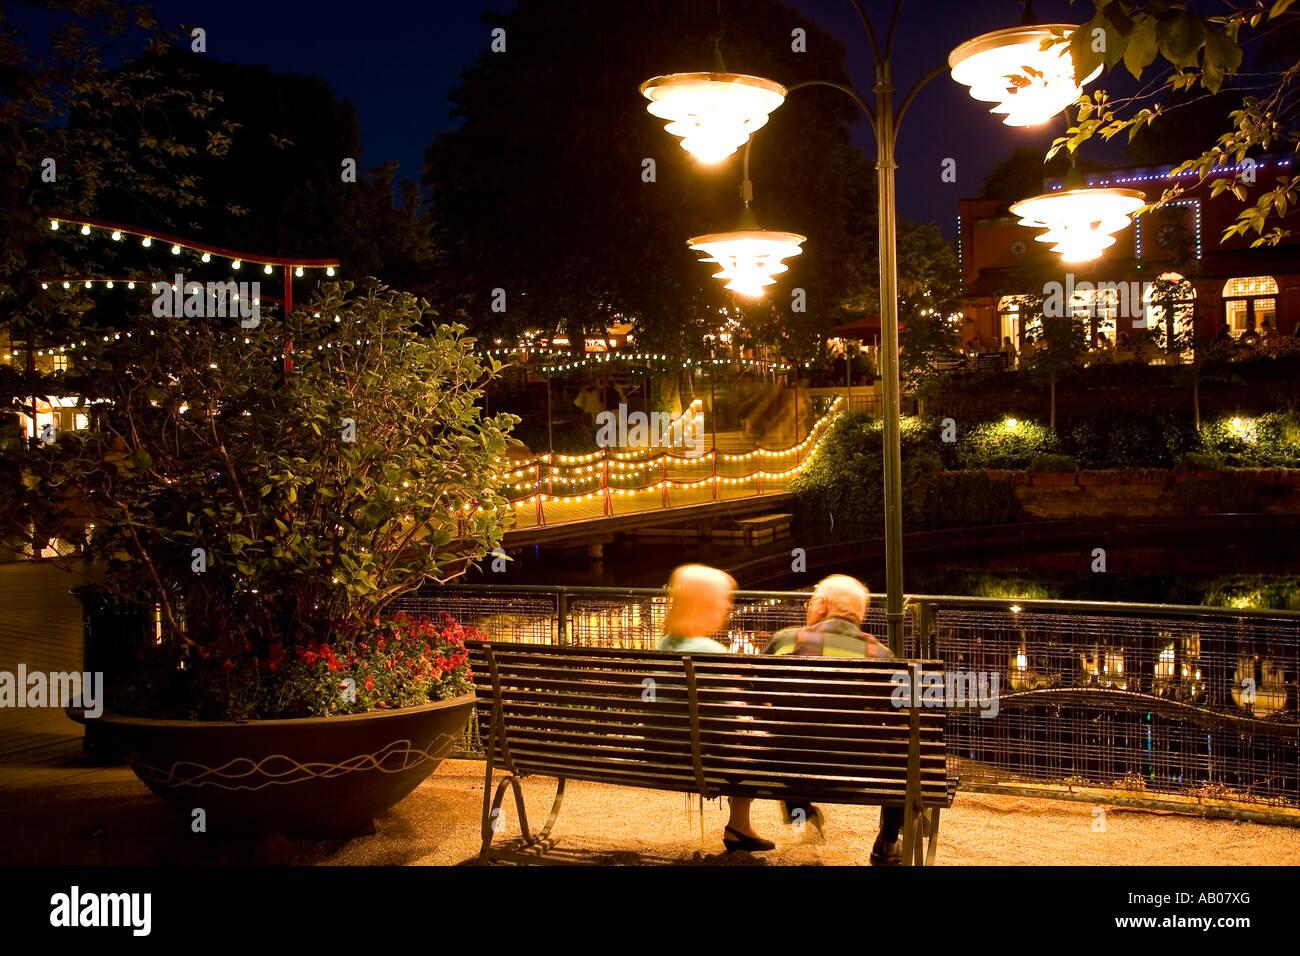 Two people enjoying the summer night at the lake in Tivoli Copenhagen - Stock Image